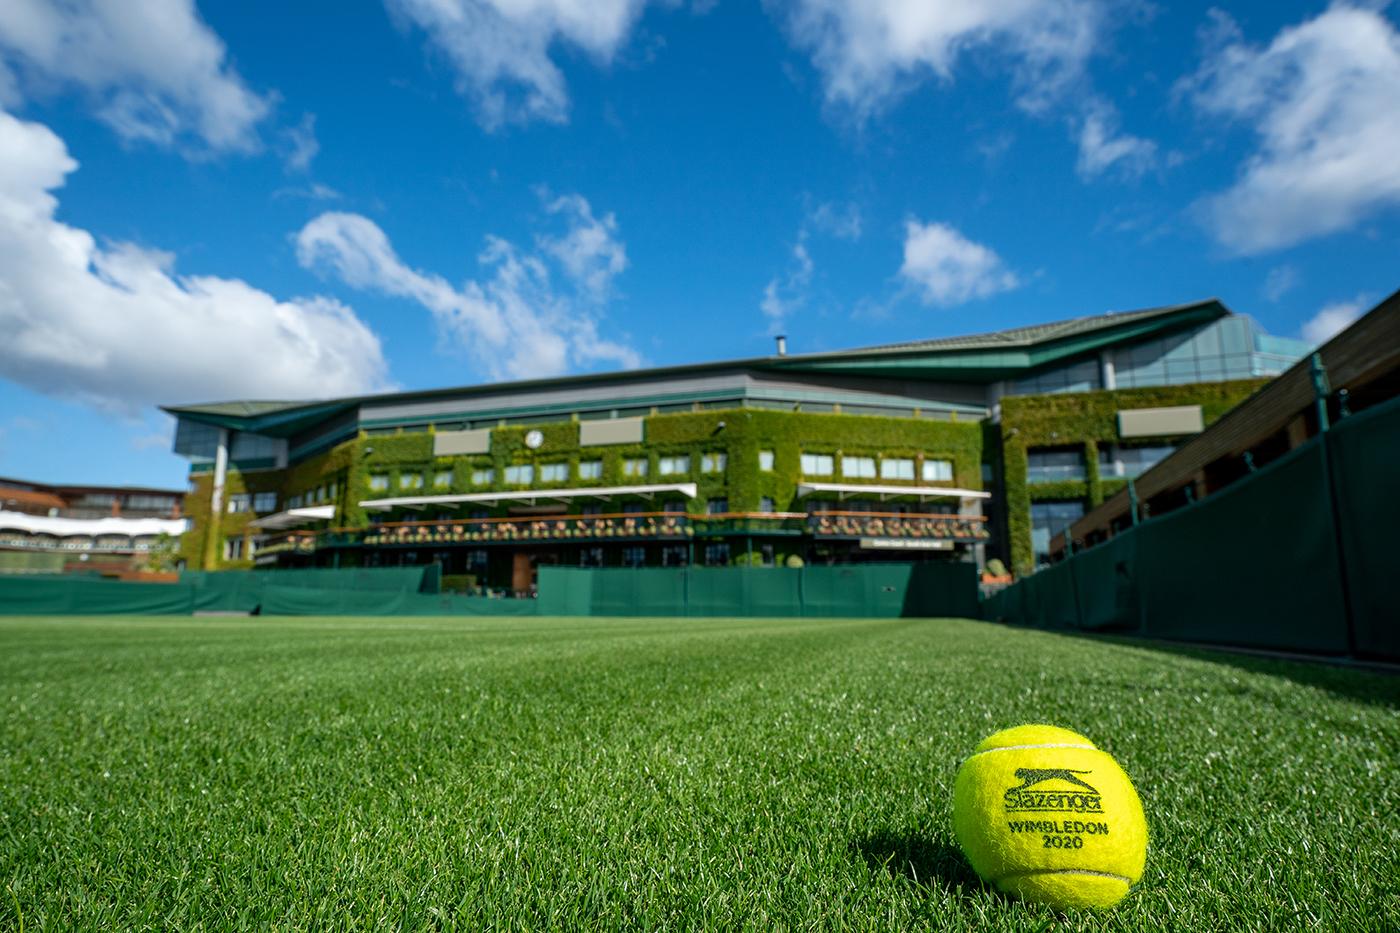 Wimbledon makes further donations